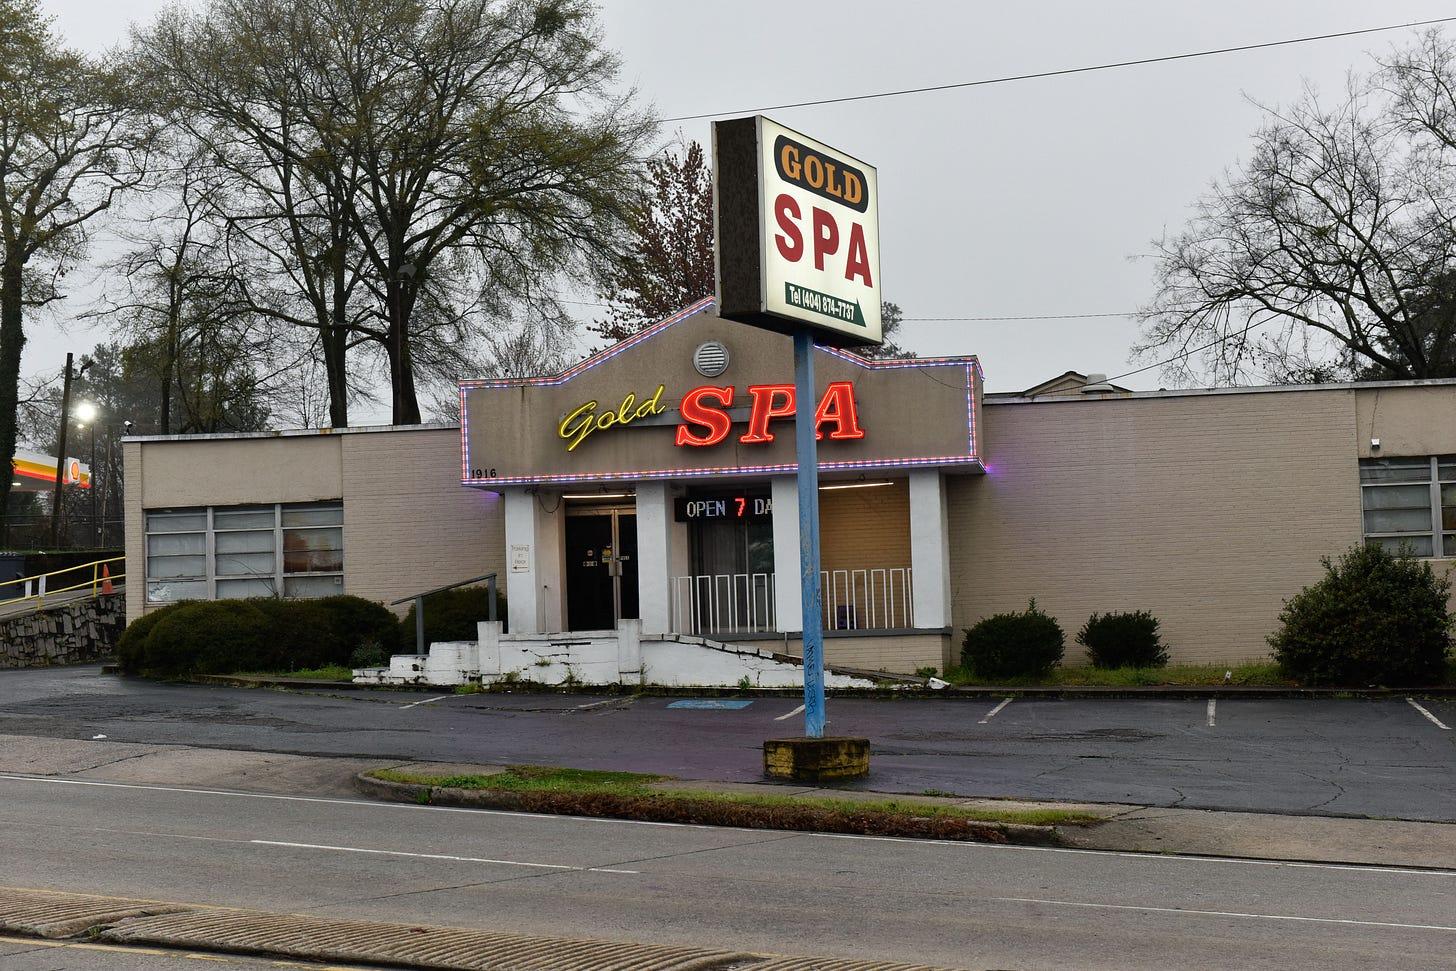 Golden Spa Site of Atlanta Shooting March 2021